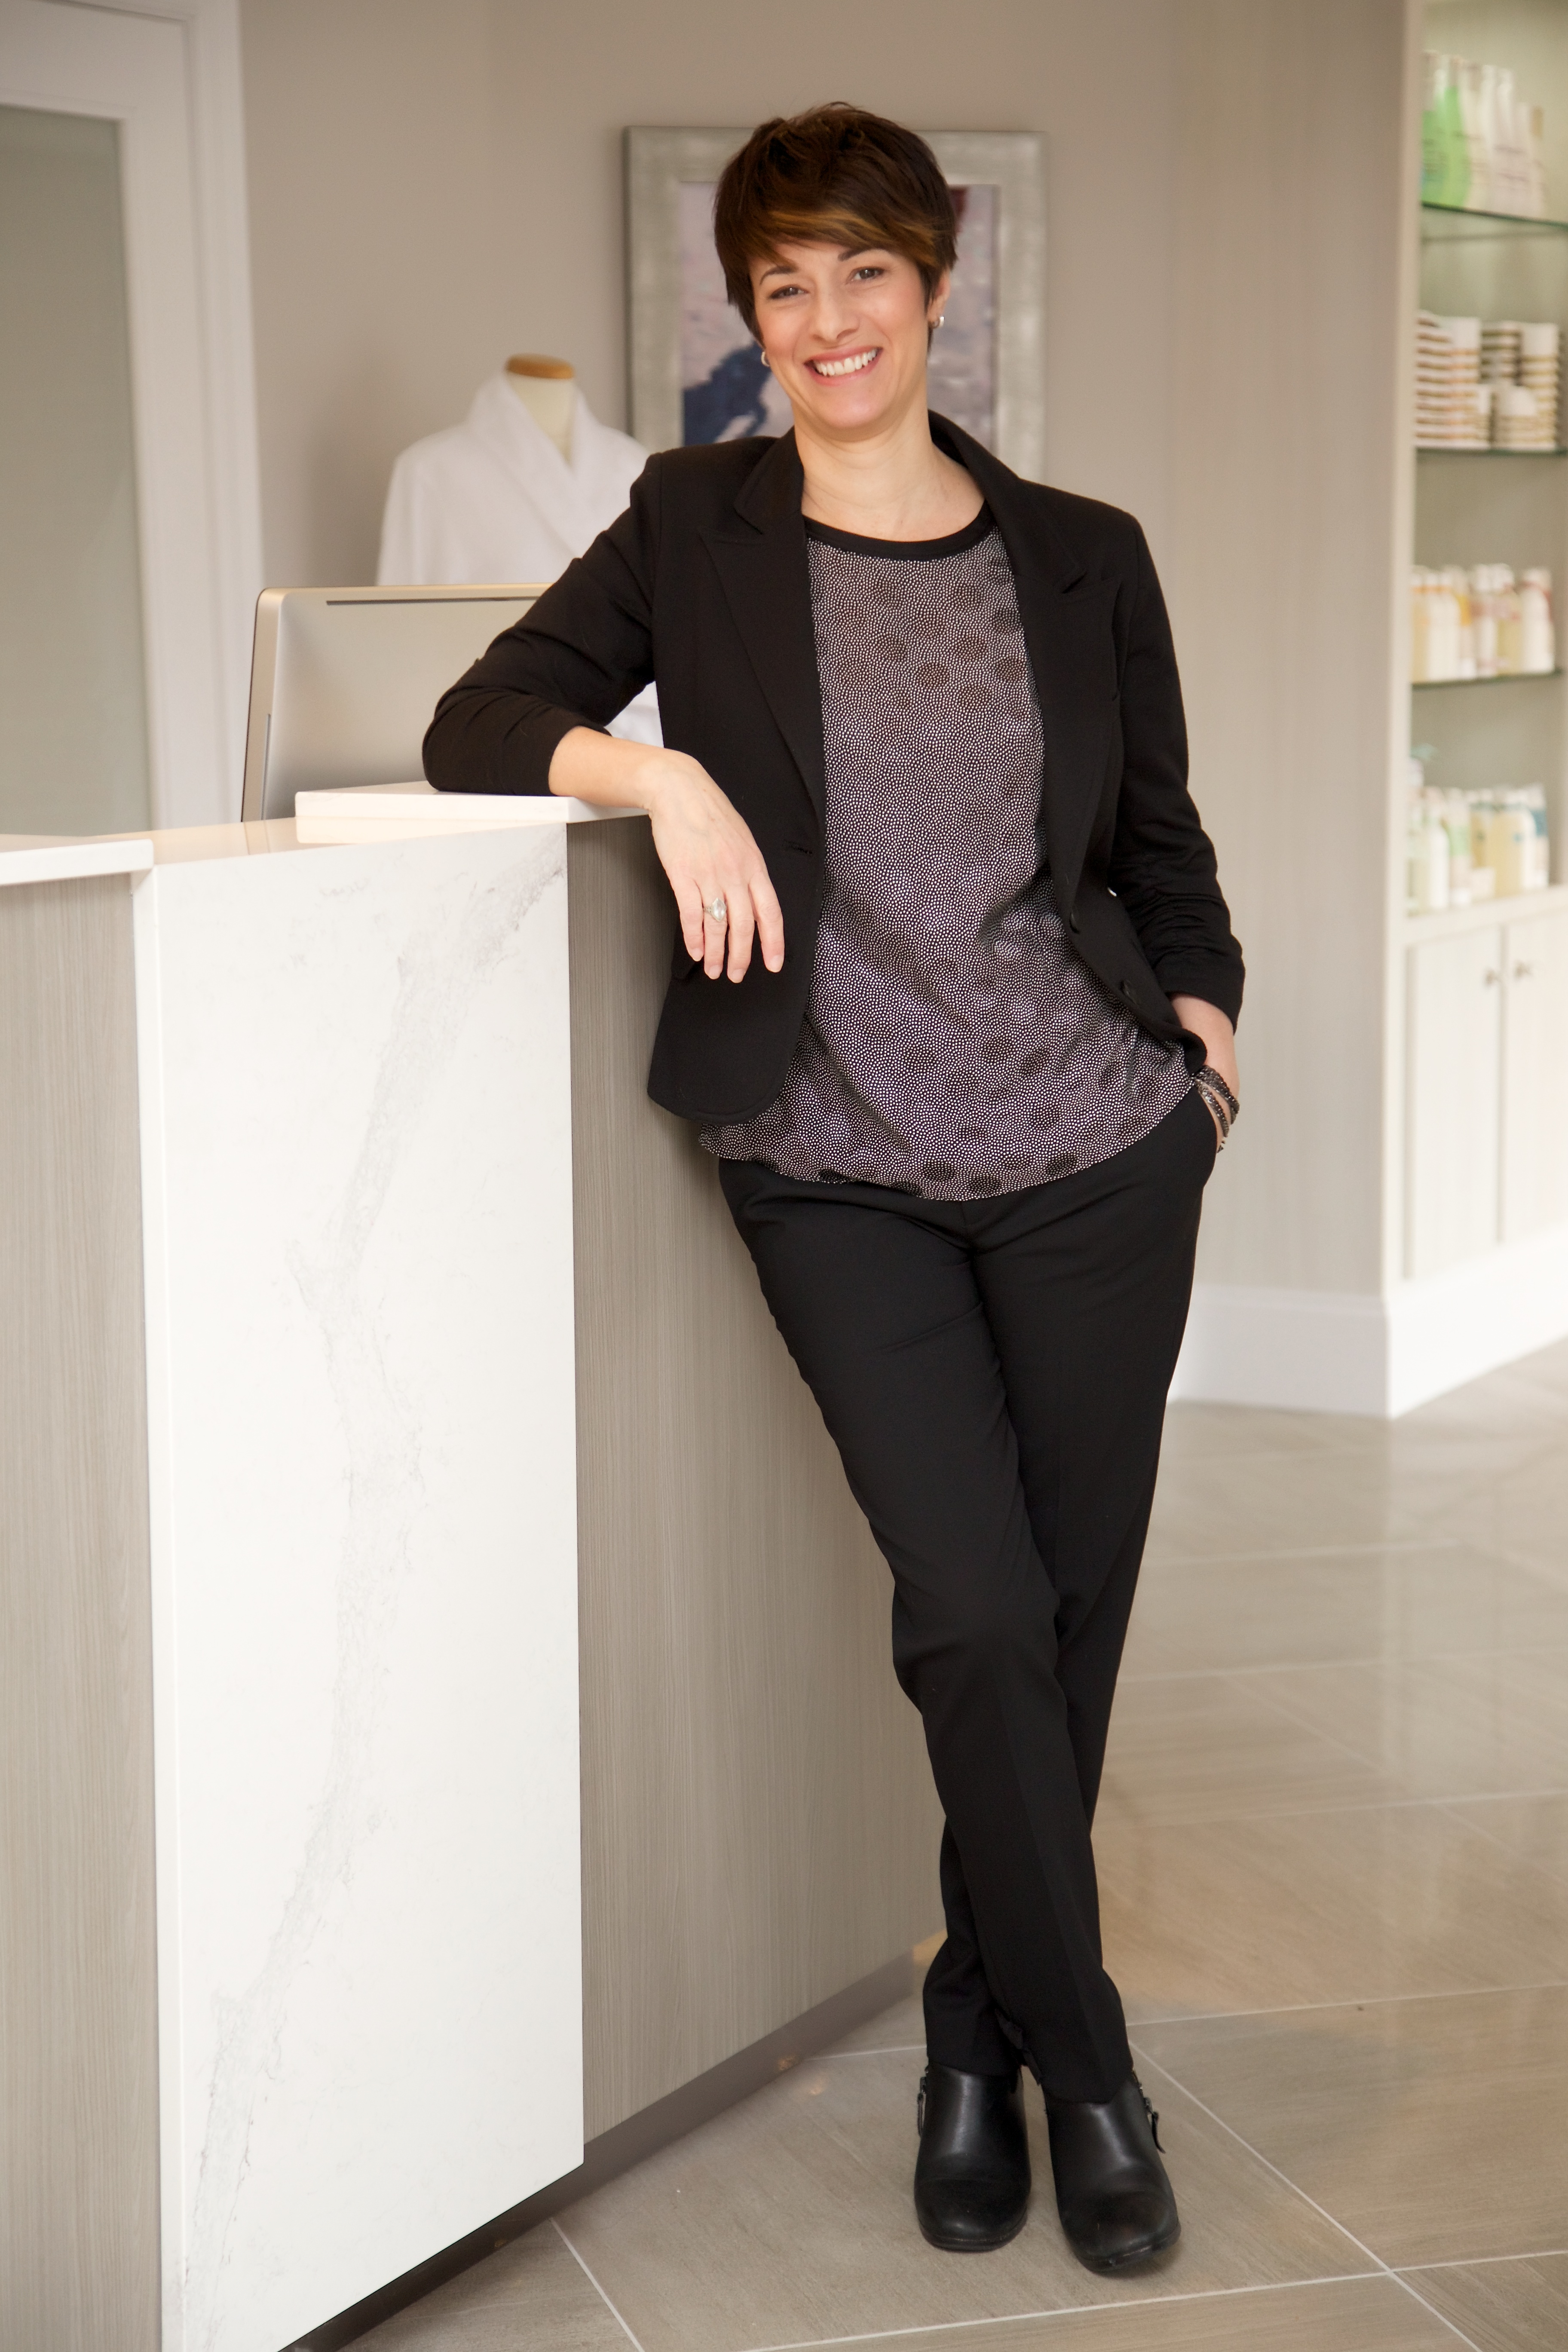 Ginny Eramo, the owner of Interlocks Salon+Spa in Newburyport, MA.